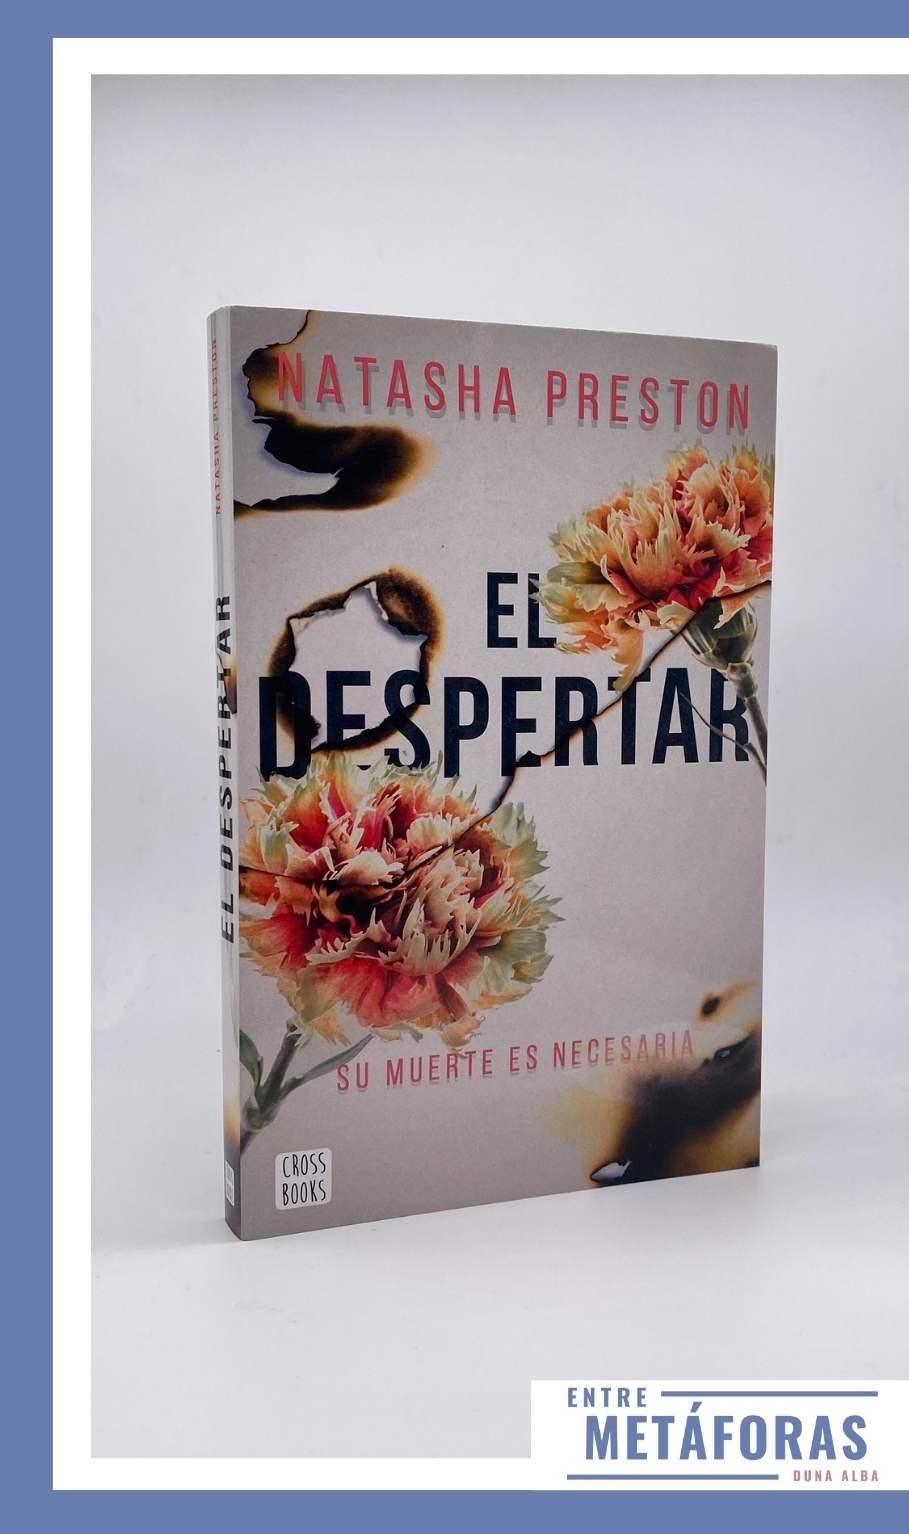 El despertar, de Natasha Preston